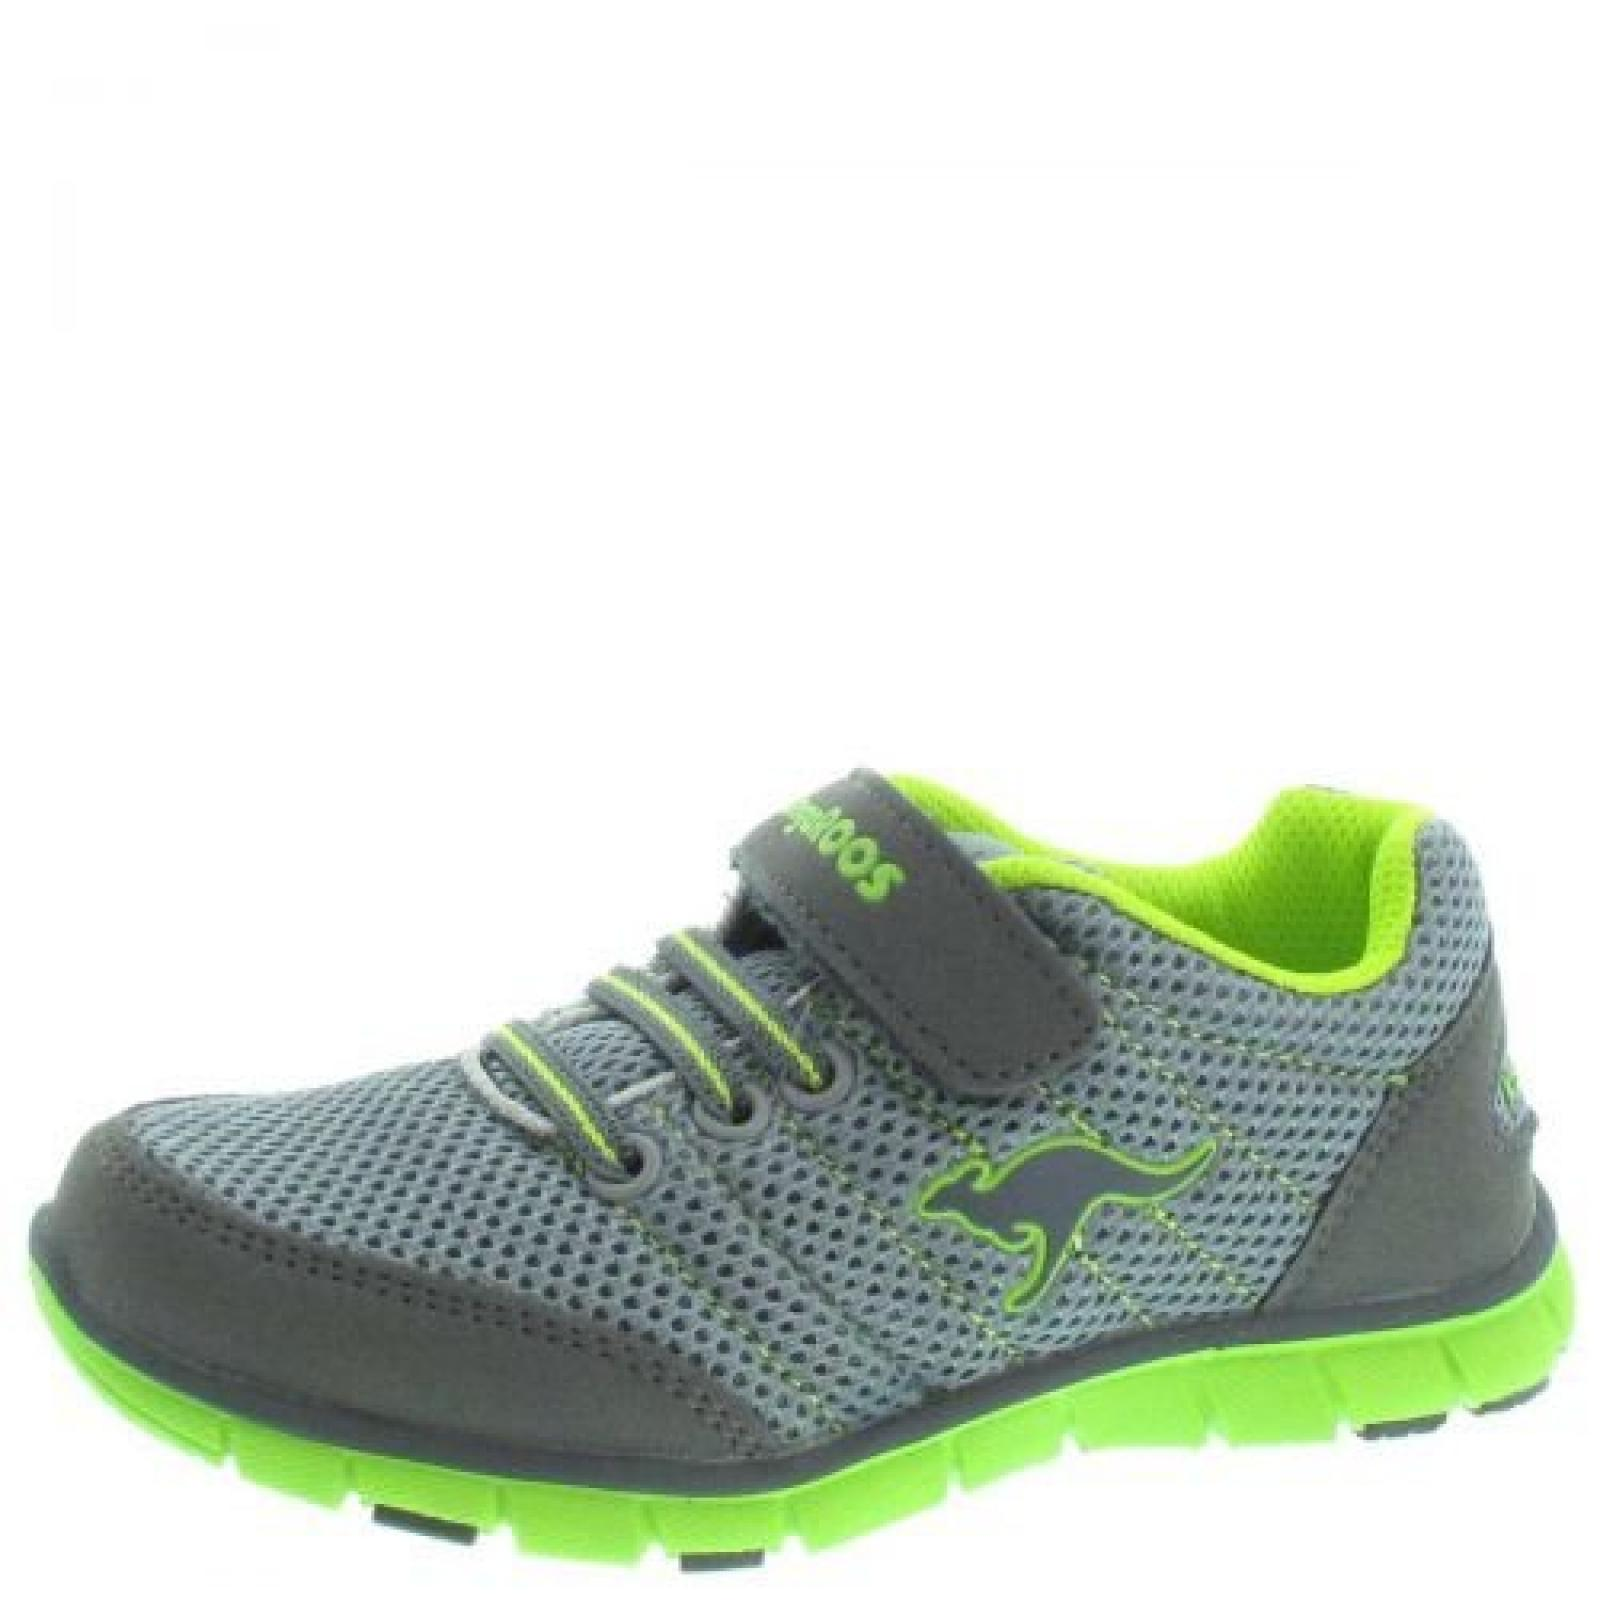 KangaROOS Nuri-Combo, Unisex-Kinder Sneakers